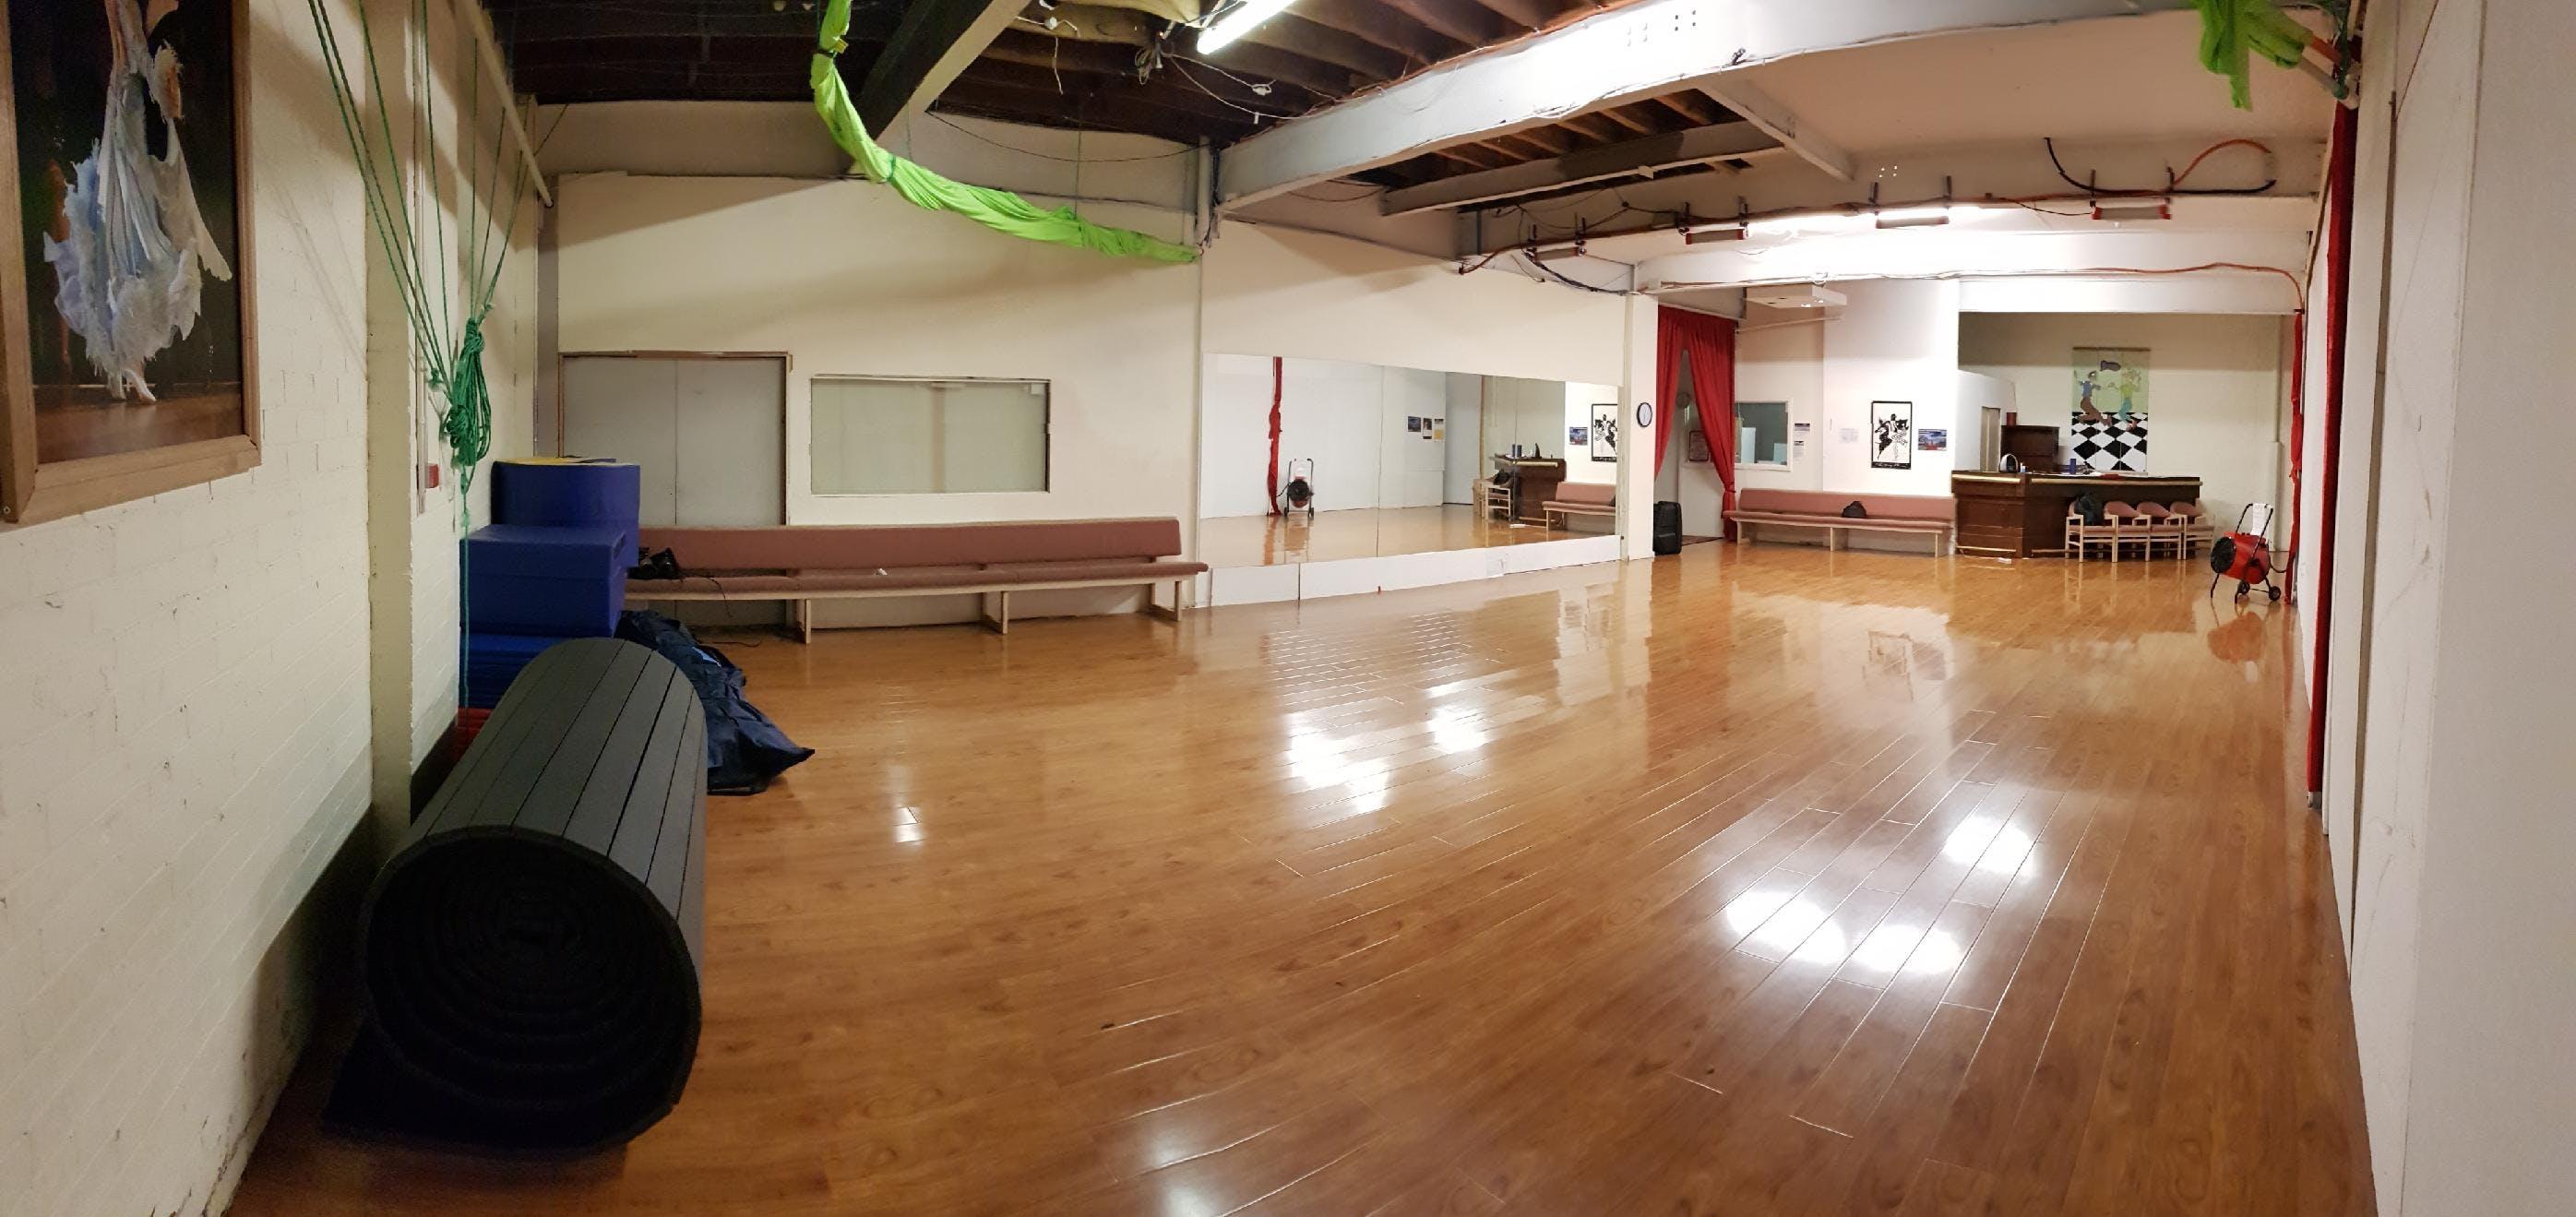 Studio 2, creative studio at Dance Be In It Centre, image 1